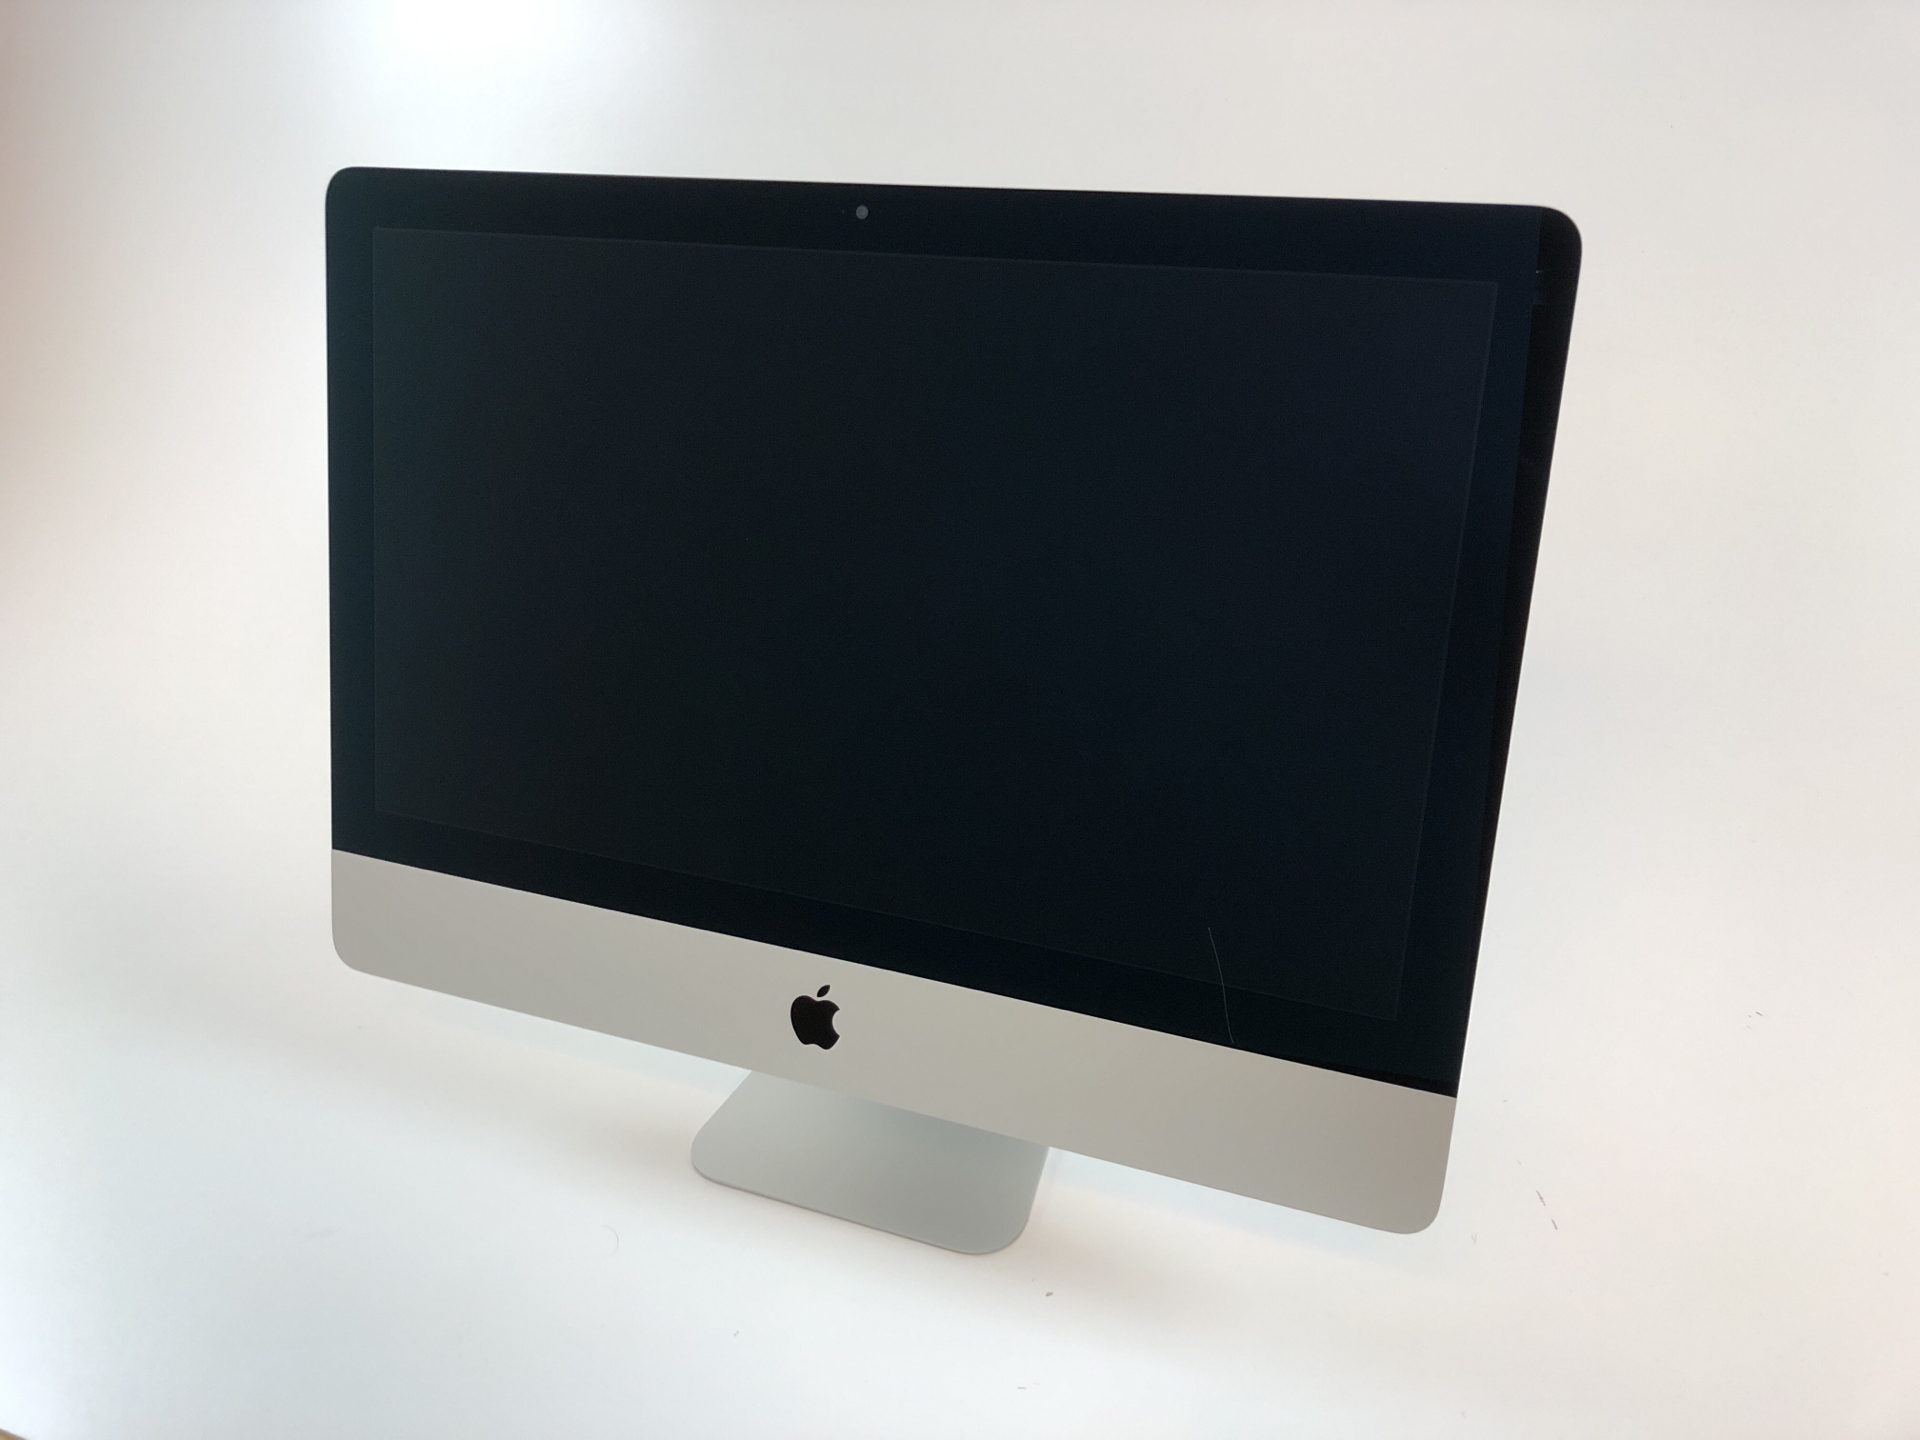 "iMac 21.5"" Mid 2017 (Intel Core i5 2.3 GHz 8 GB RAM 1 TB HDD), Intel Core i5 2.3 GHz, 8 GB RAM, 1 TB HDD, Afbeelding 1"